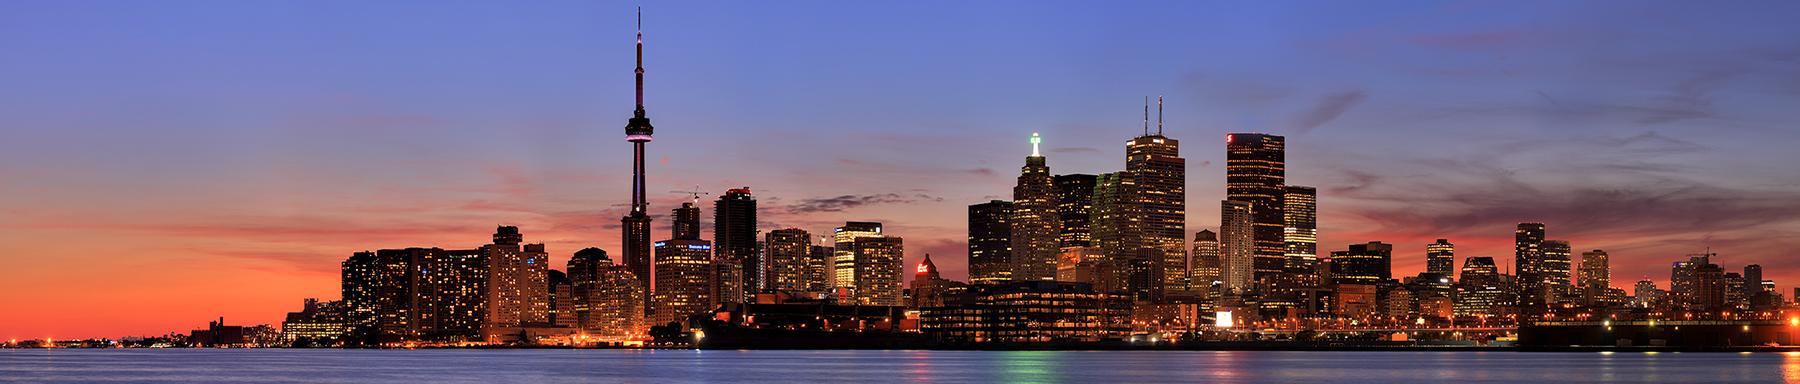 Toronto skyline by Martin St-Amant (CC BY-SA 3.0)